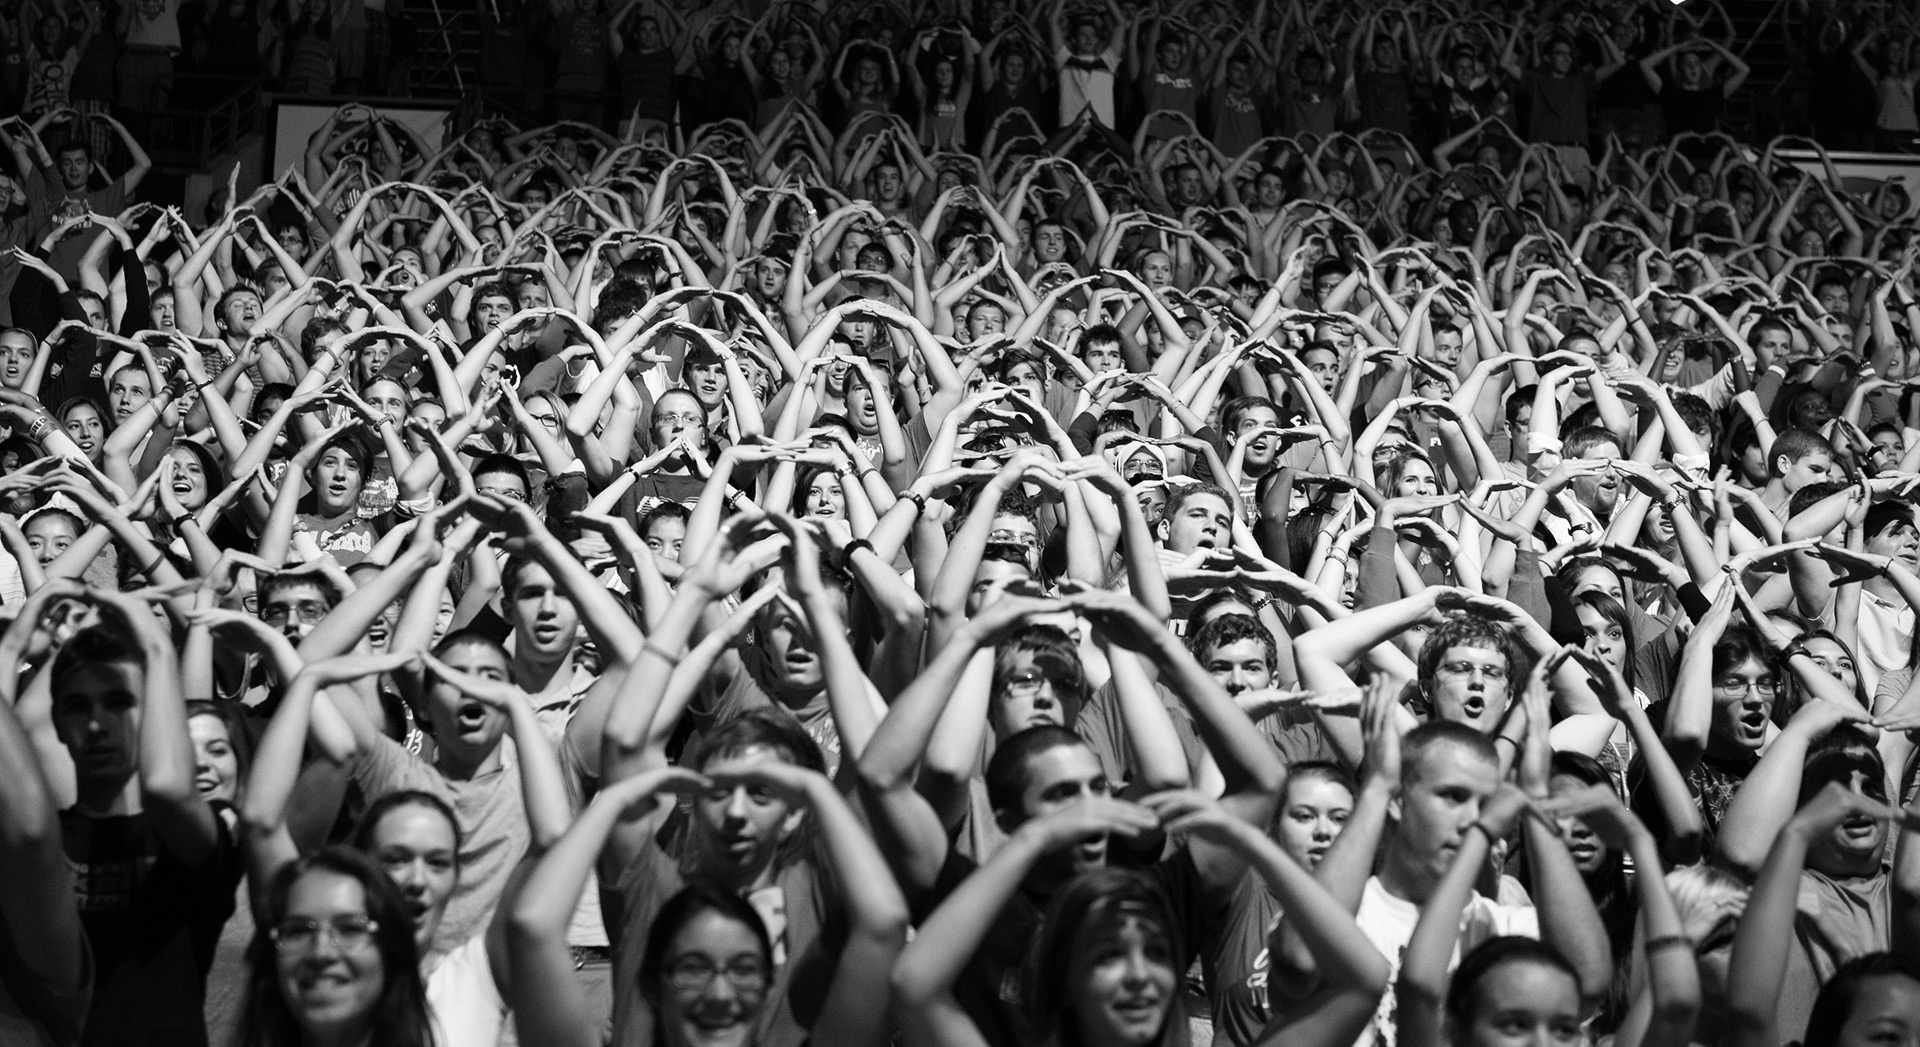 Ohio State University - freshman welcome O crowd